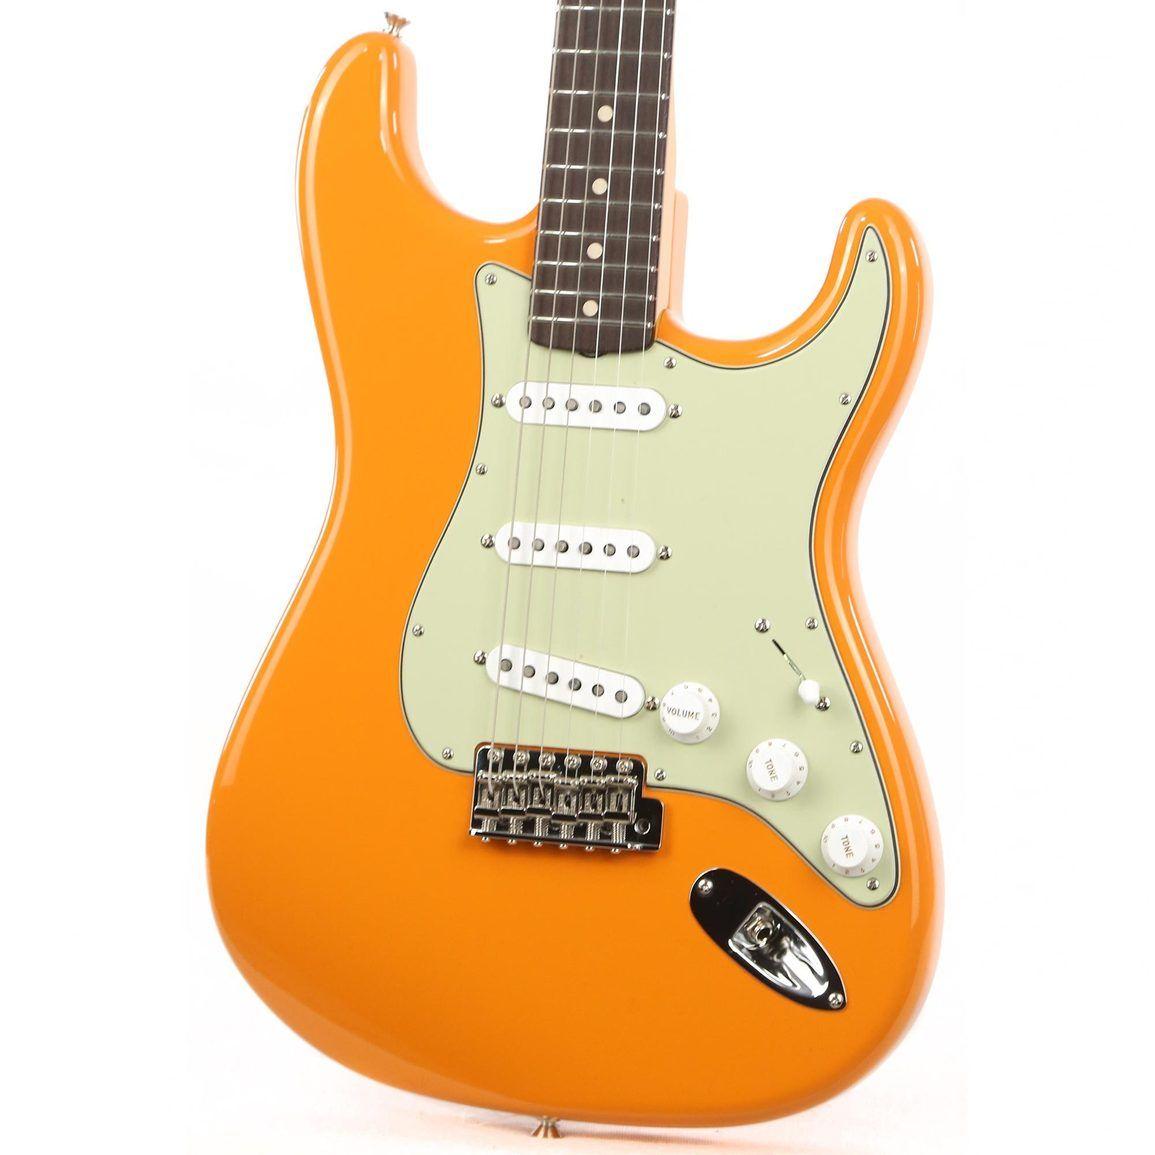 Fender Custom Shop Noneck Stratocaster Nos Capri Orange Music Zoo Exclusive R112980 Fender Custom Shop American Vintage U Neck